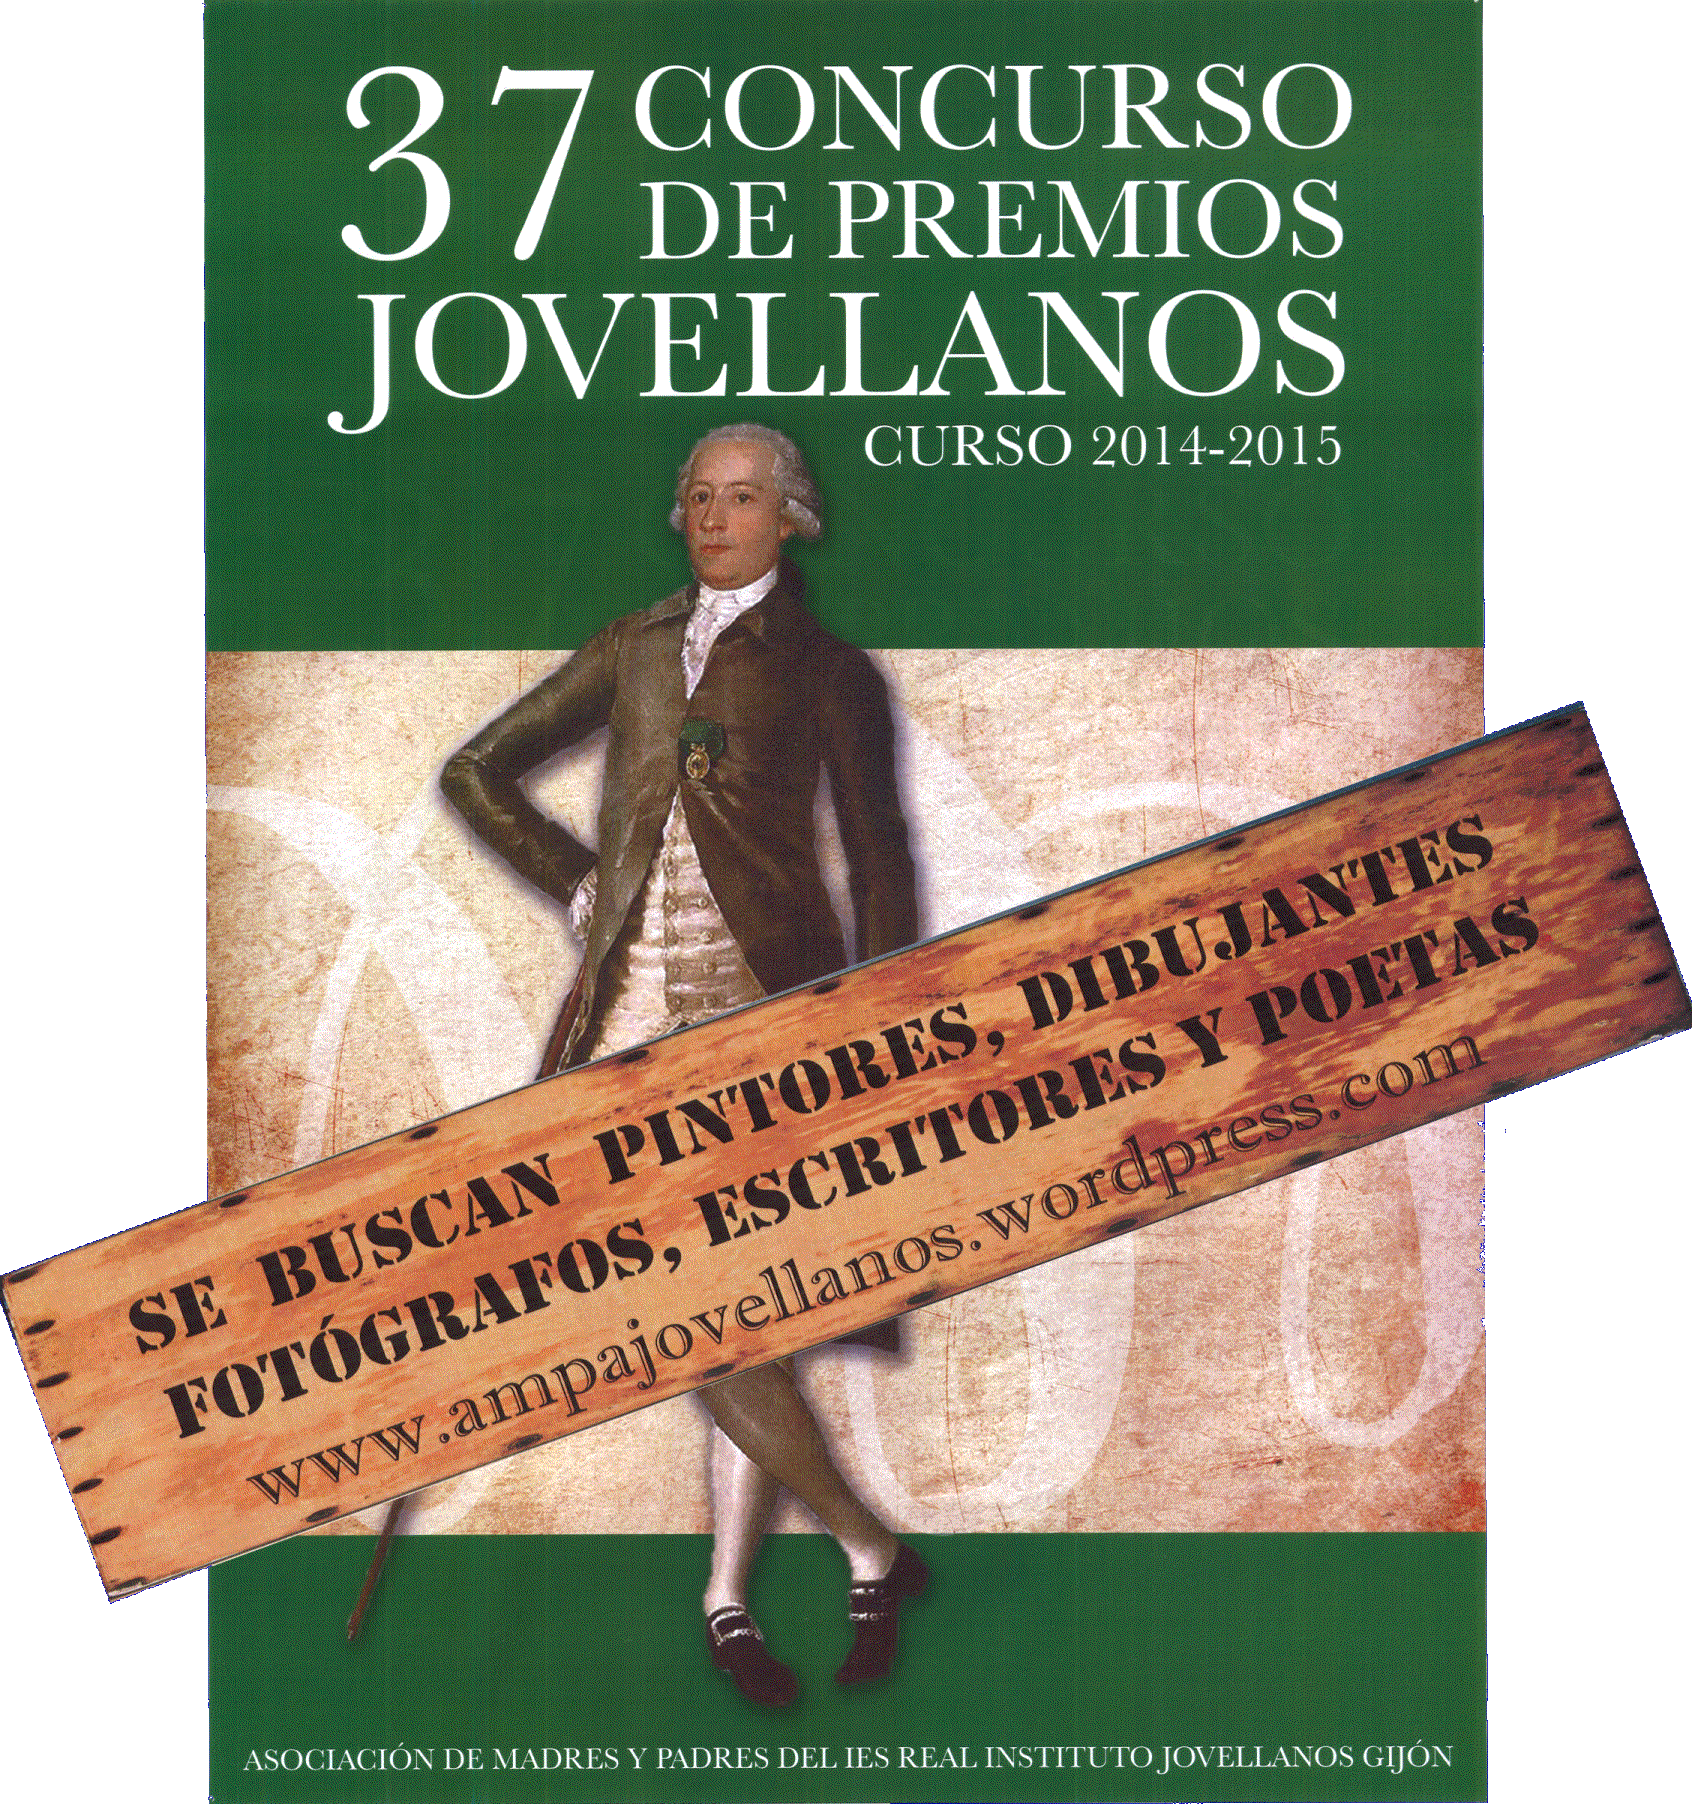 37 Concurso de Premios Jovellanos